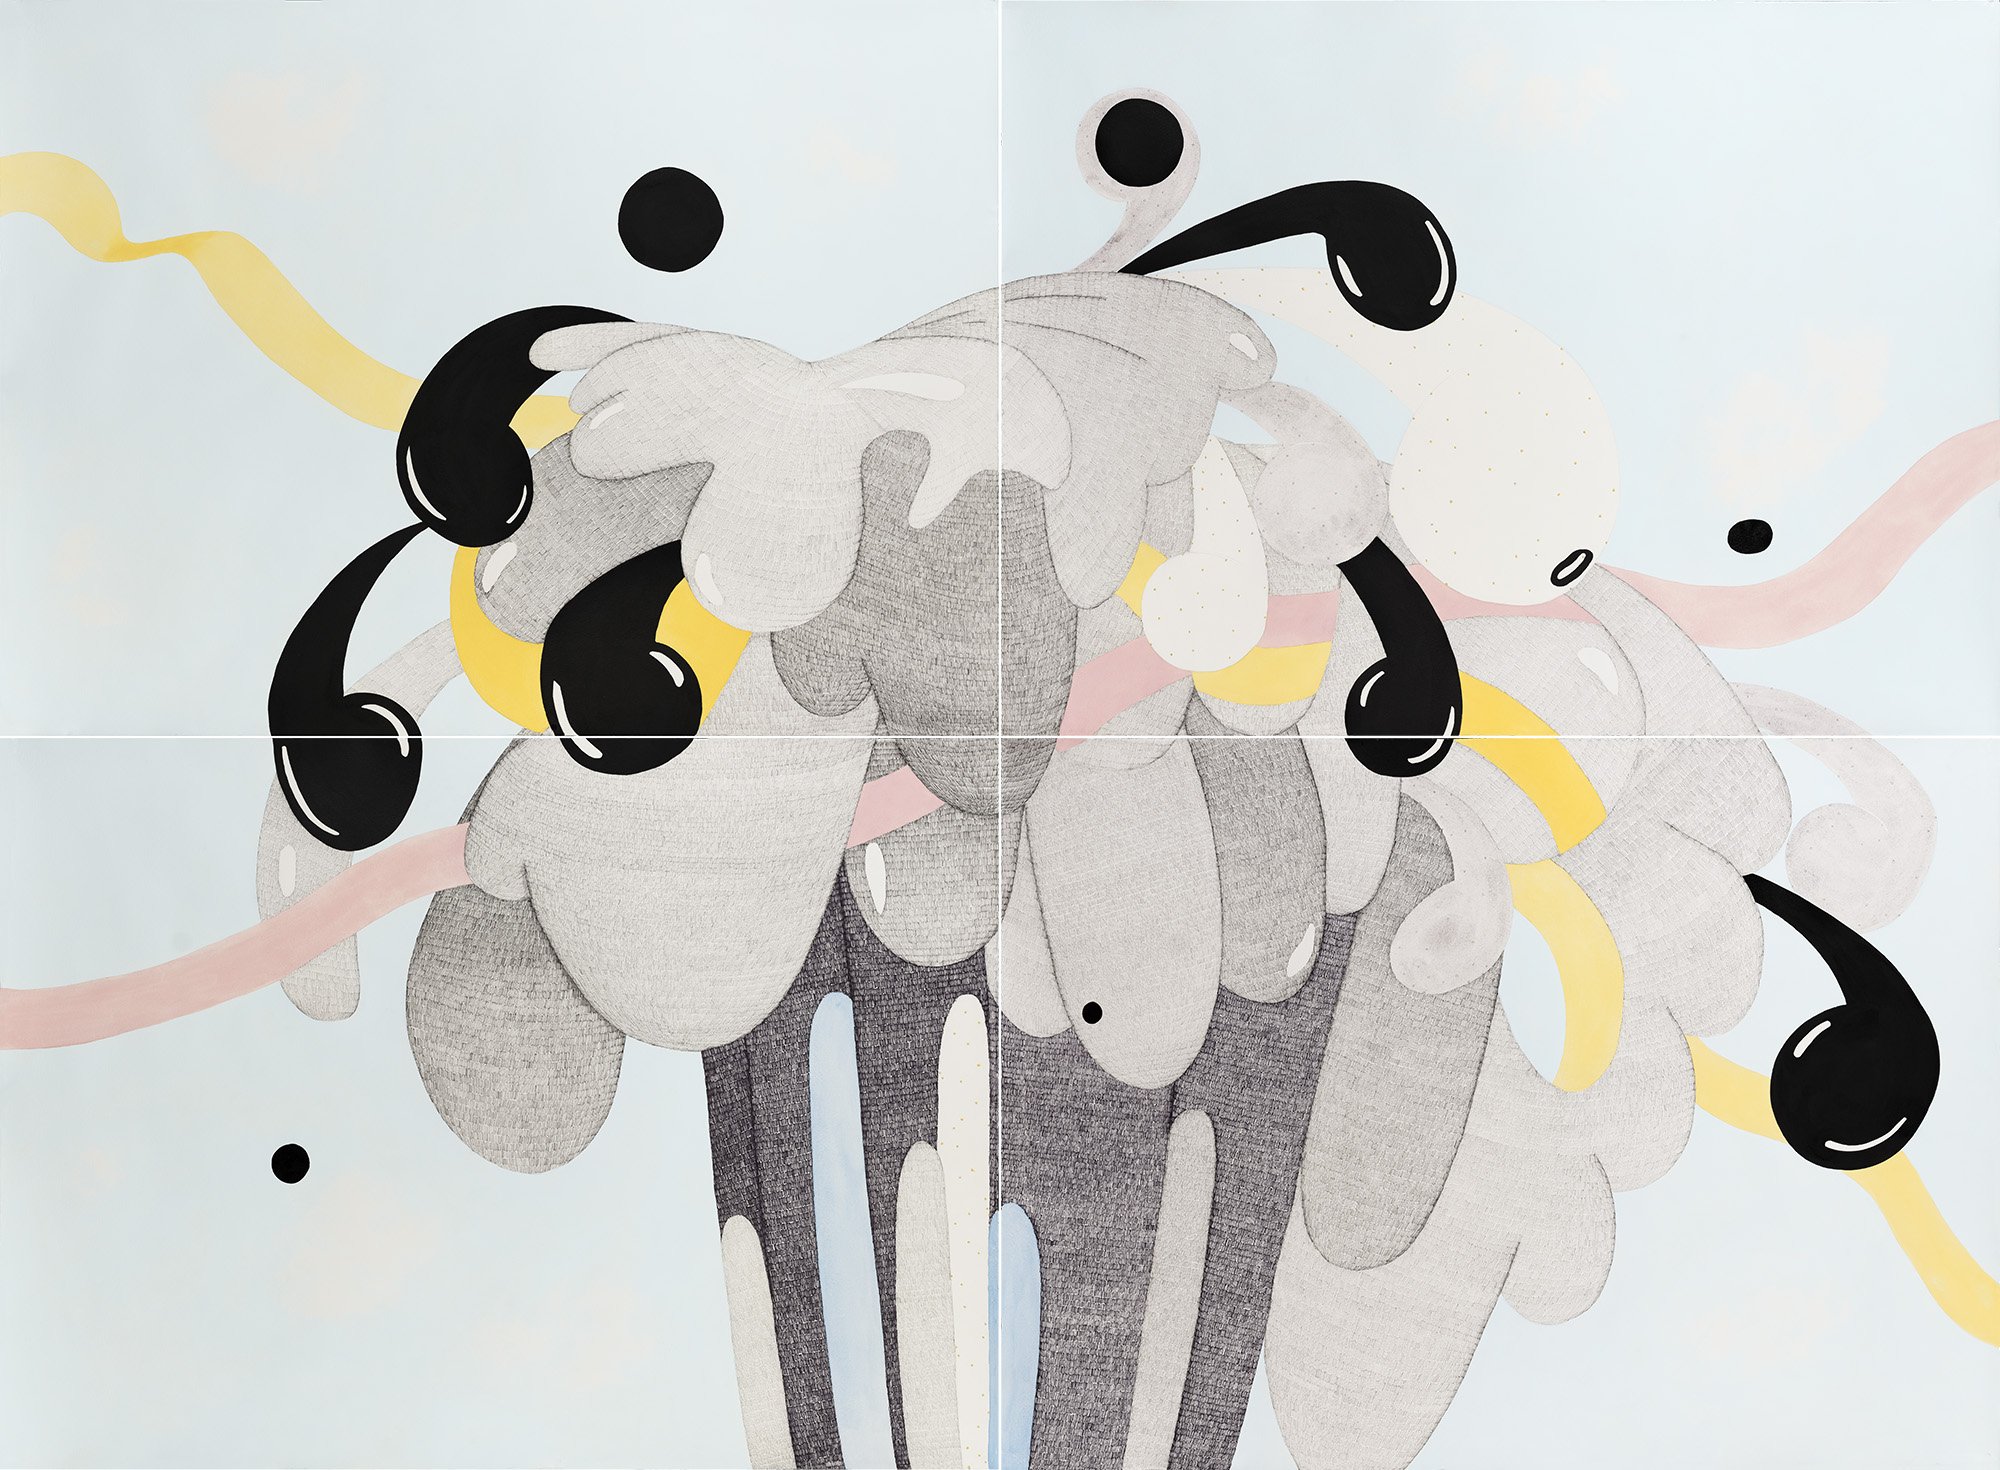 The Bubbler – Jackpot    2018  Pen, watercolour, white gouache, graphite, liquid graphite, Indian ink and acrylic on Hahnemühle paper  158 x 216 cm